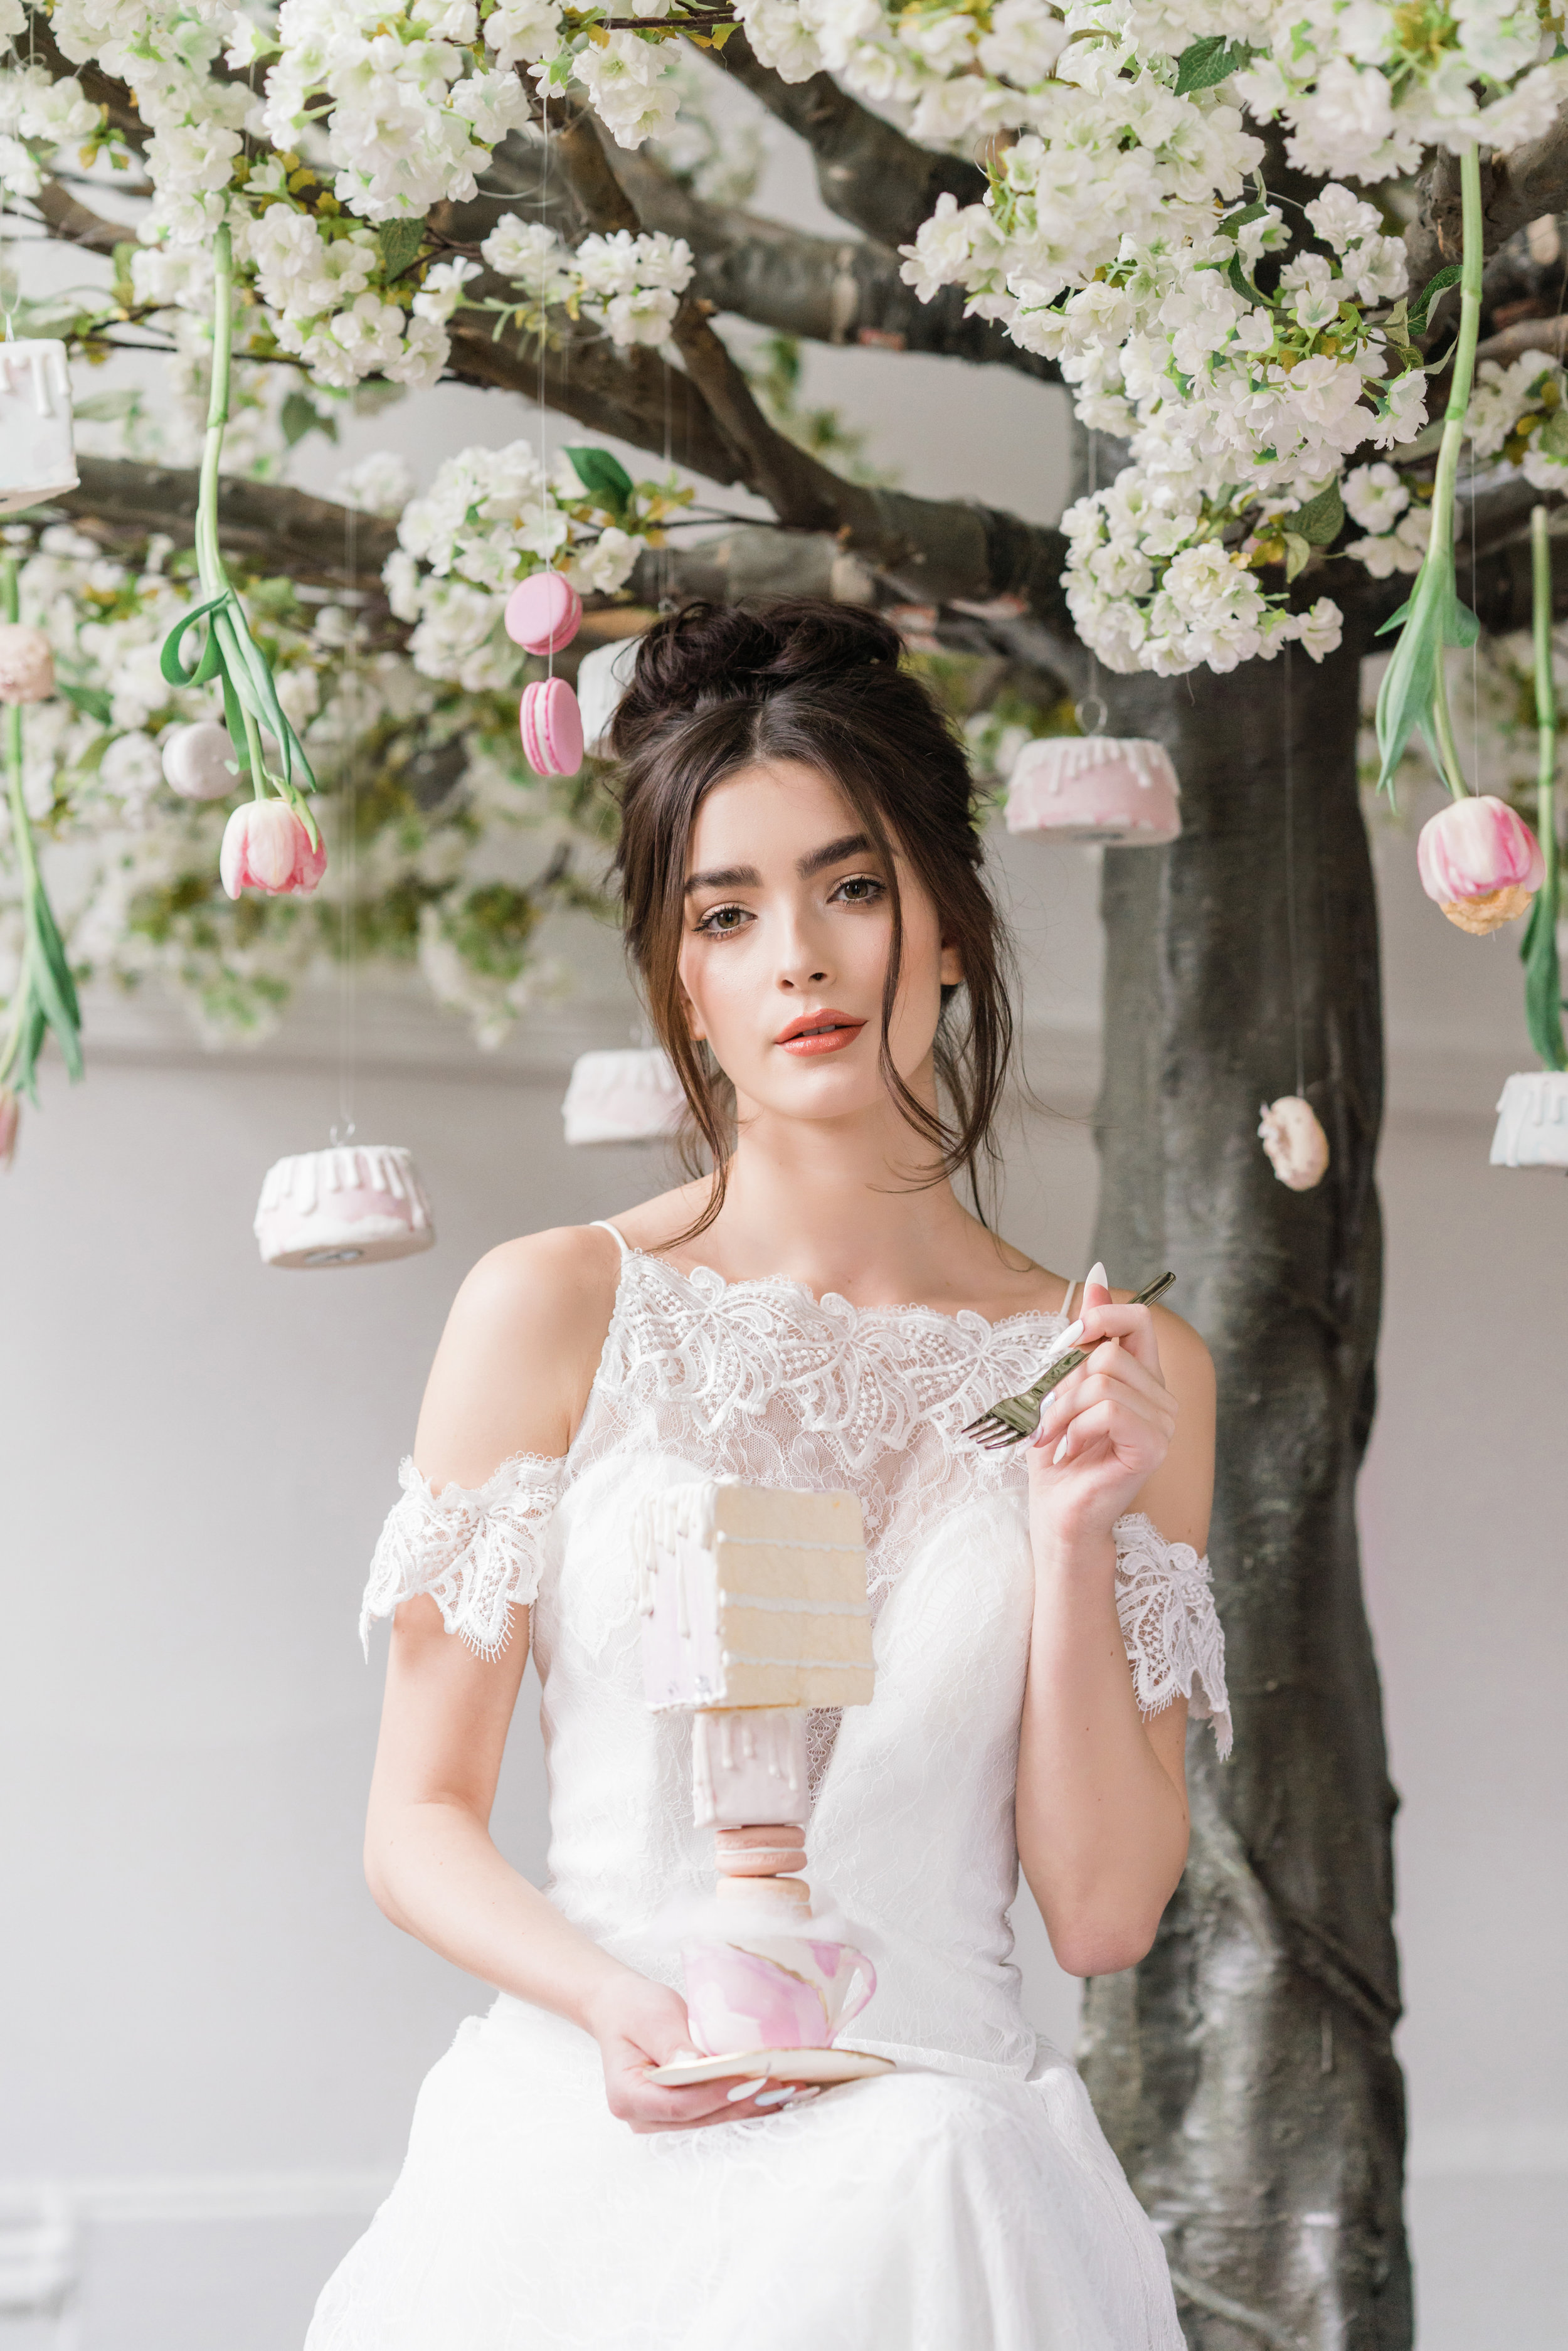 August In Bloom - Bride Holding Dessert - Serene Dream